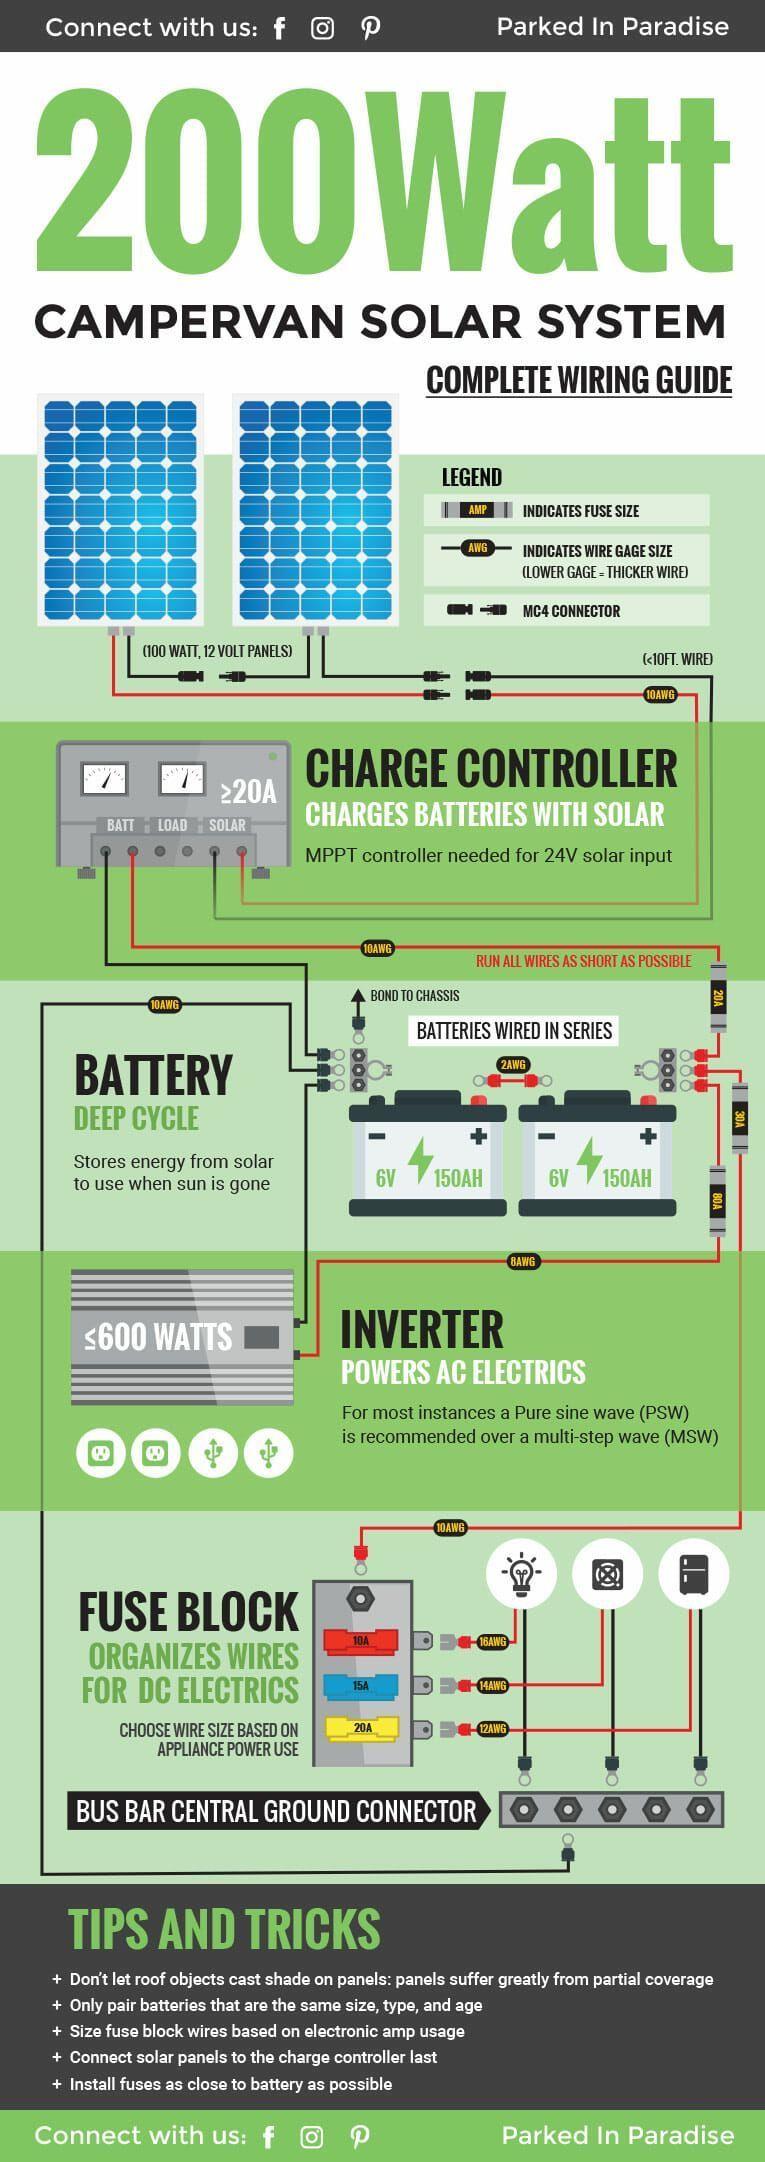 medium resolution of complete diy wiring guide for a 200 watt solar panel system perfect diy garage wiring